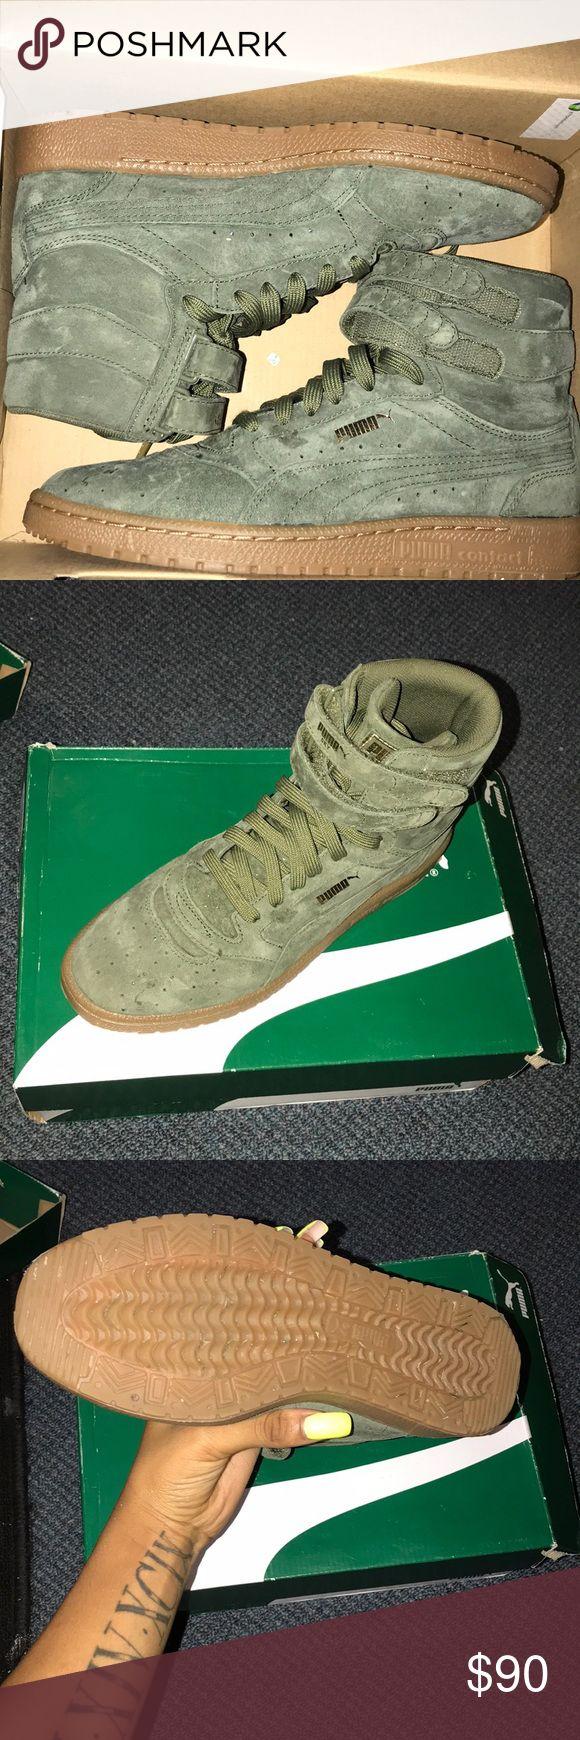 Pumas Sky II Hi NBK Womens  Burnt Olive & Gold  Pumas Puma Shoes Sneakers